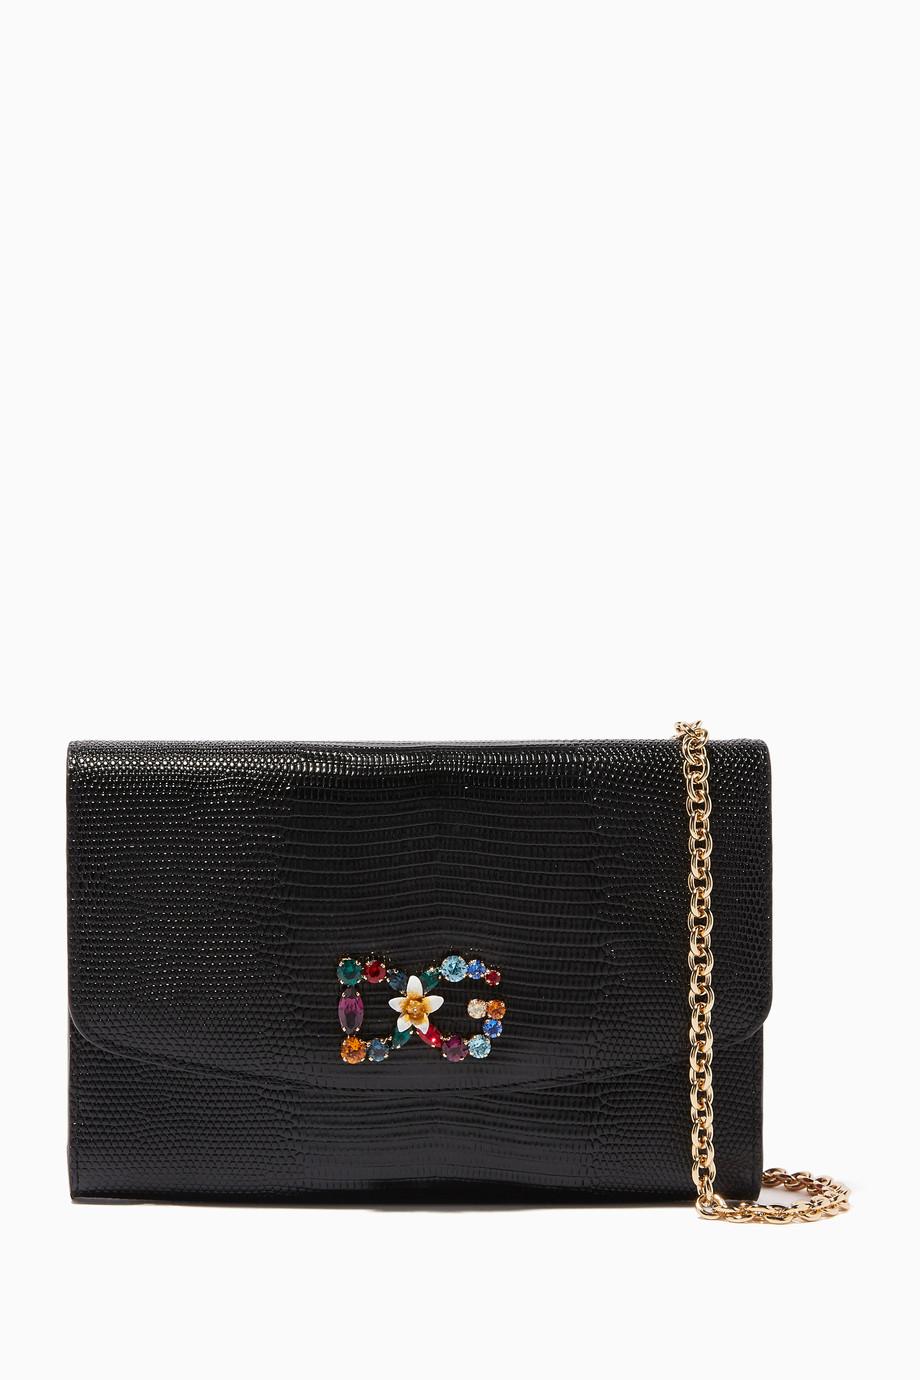 eb523f73a3 Shop Dolce   Gabbana Black Black Iguana-Printed Leather Wallet ...